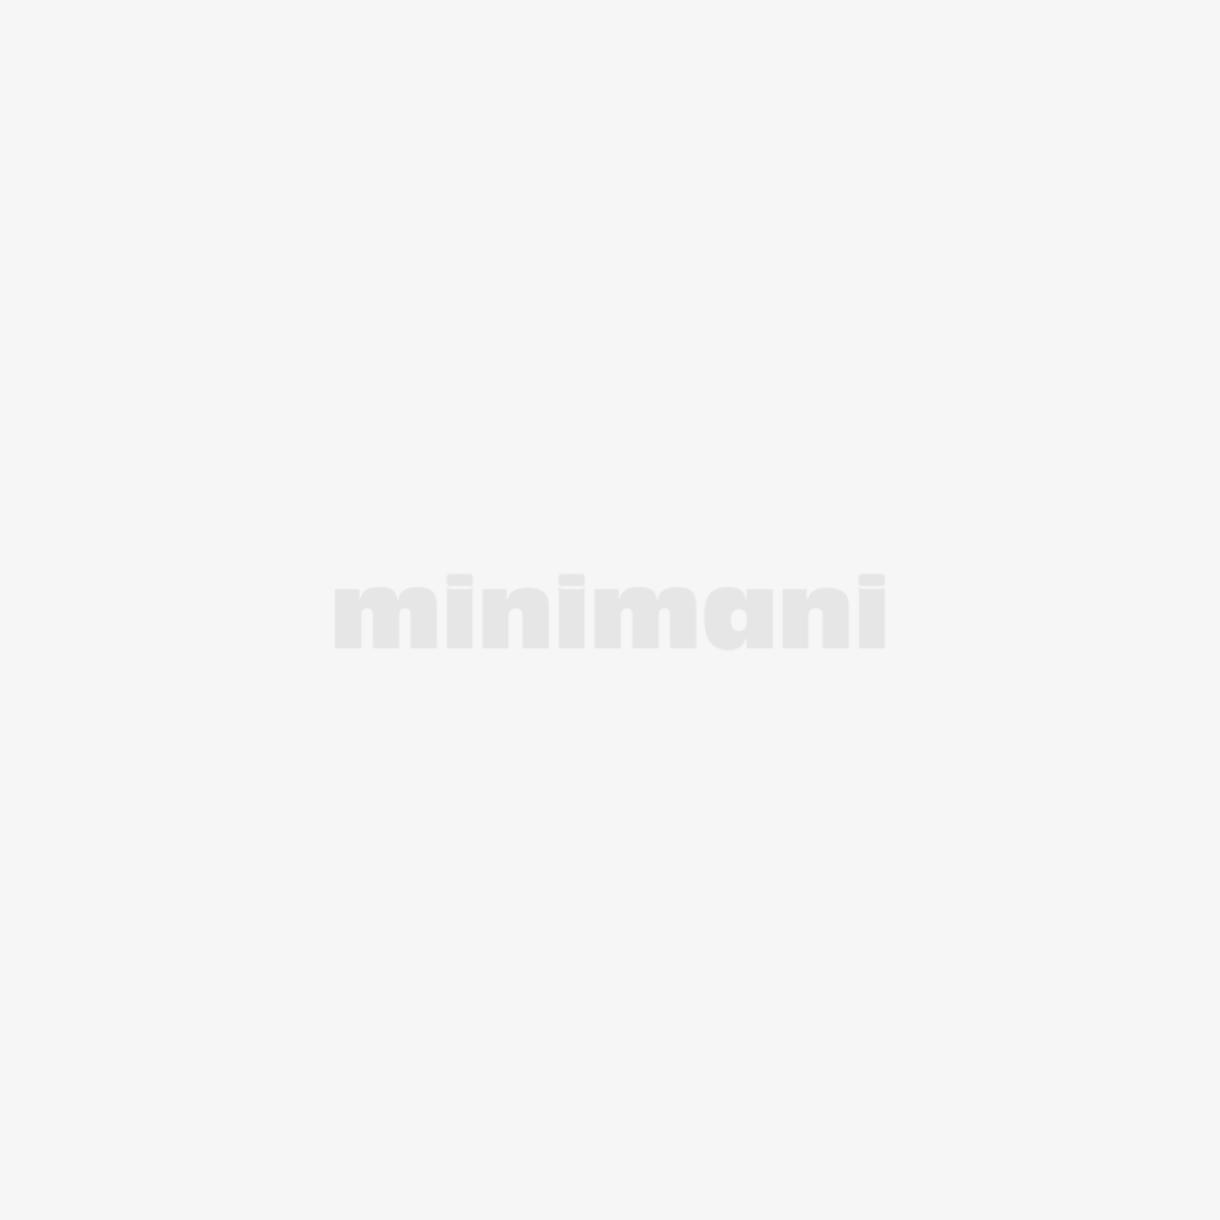 HAHNEMÜHLE HAND LETTERING-LEHTIÖ A4 (25) 170G